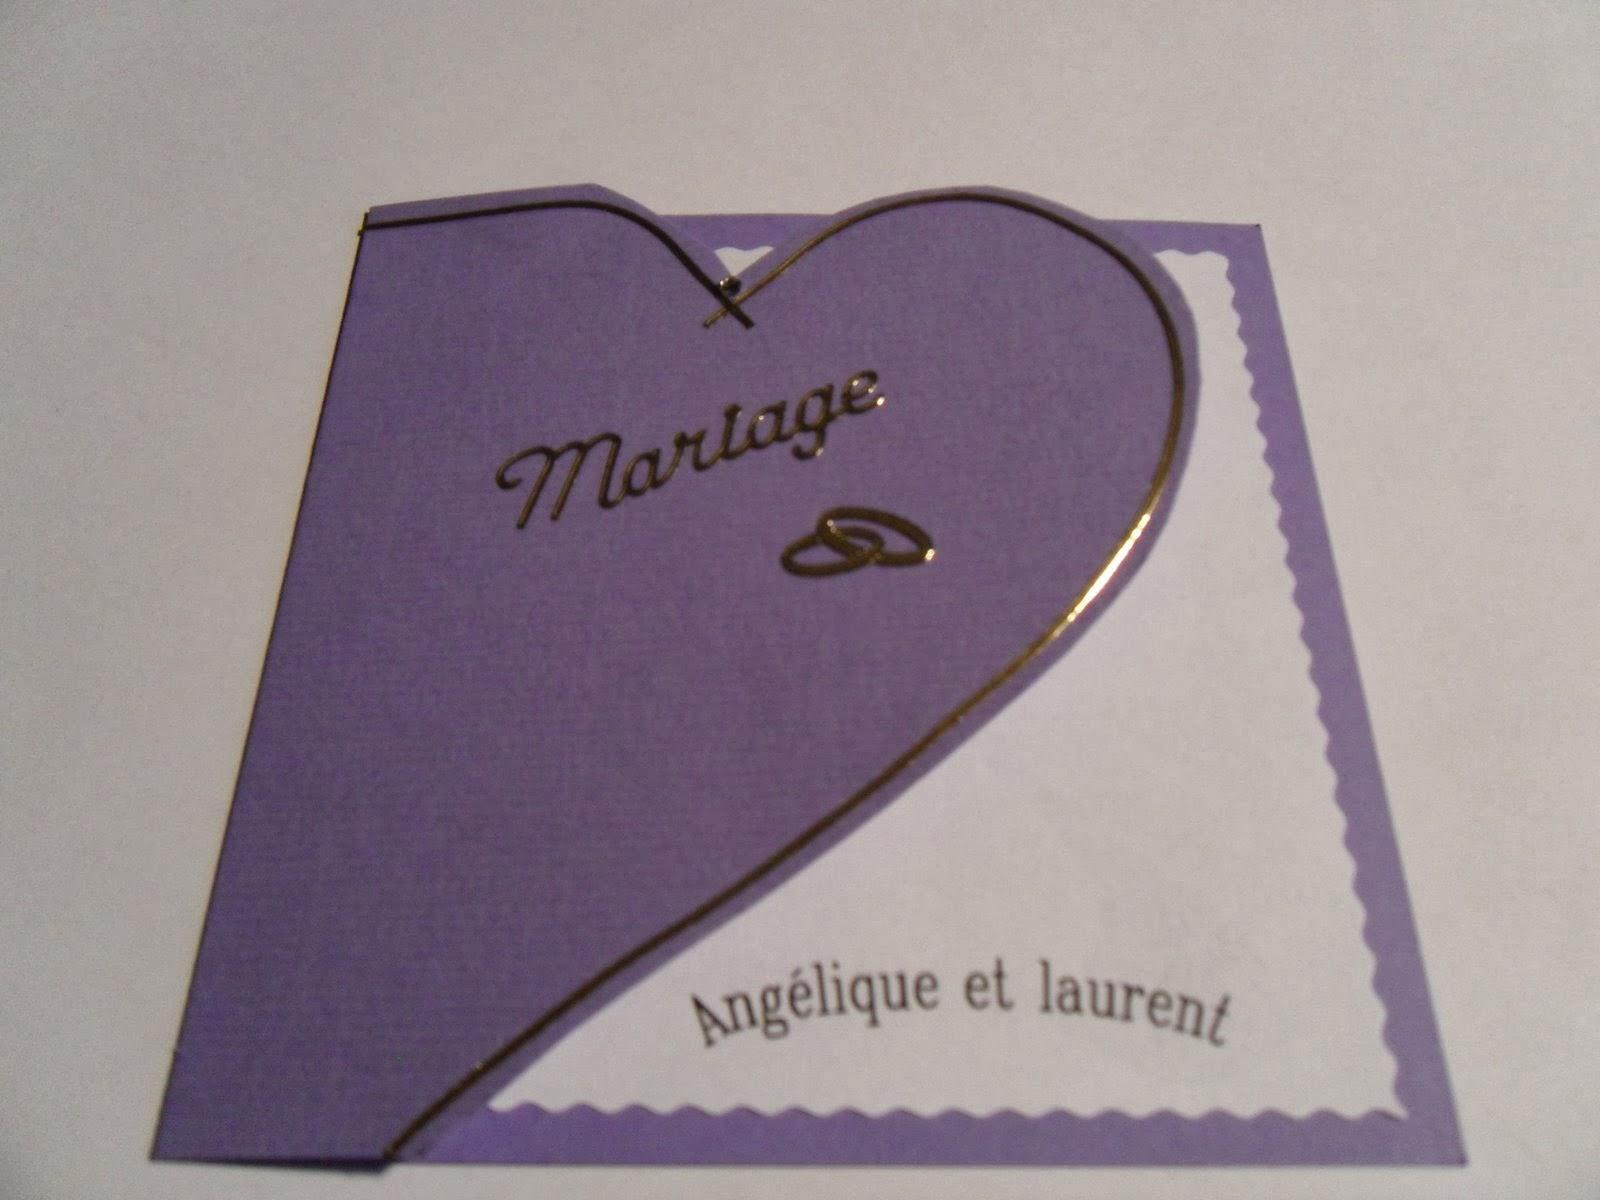 carte de mariage fait main invitation mariage carte mariage texte mariage cadeau mariage. Black Bedroom Furniture Sets. Home Design Ideas